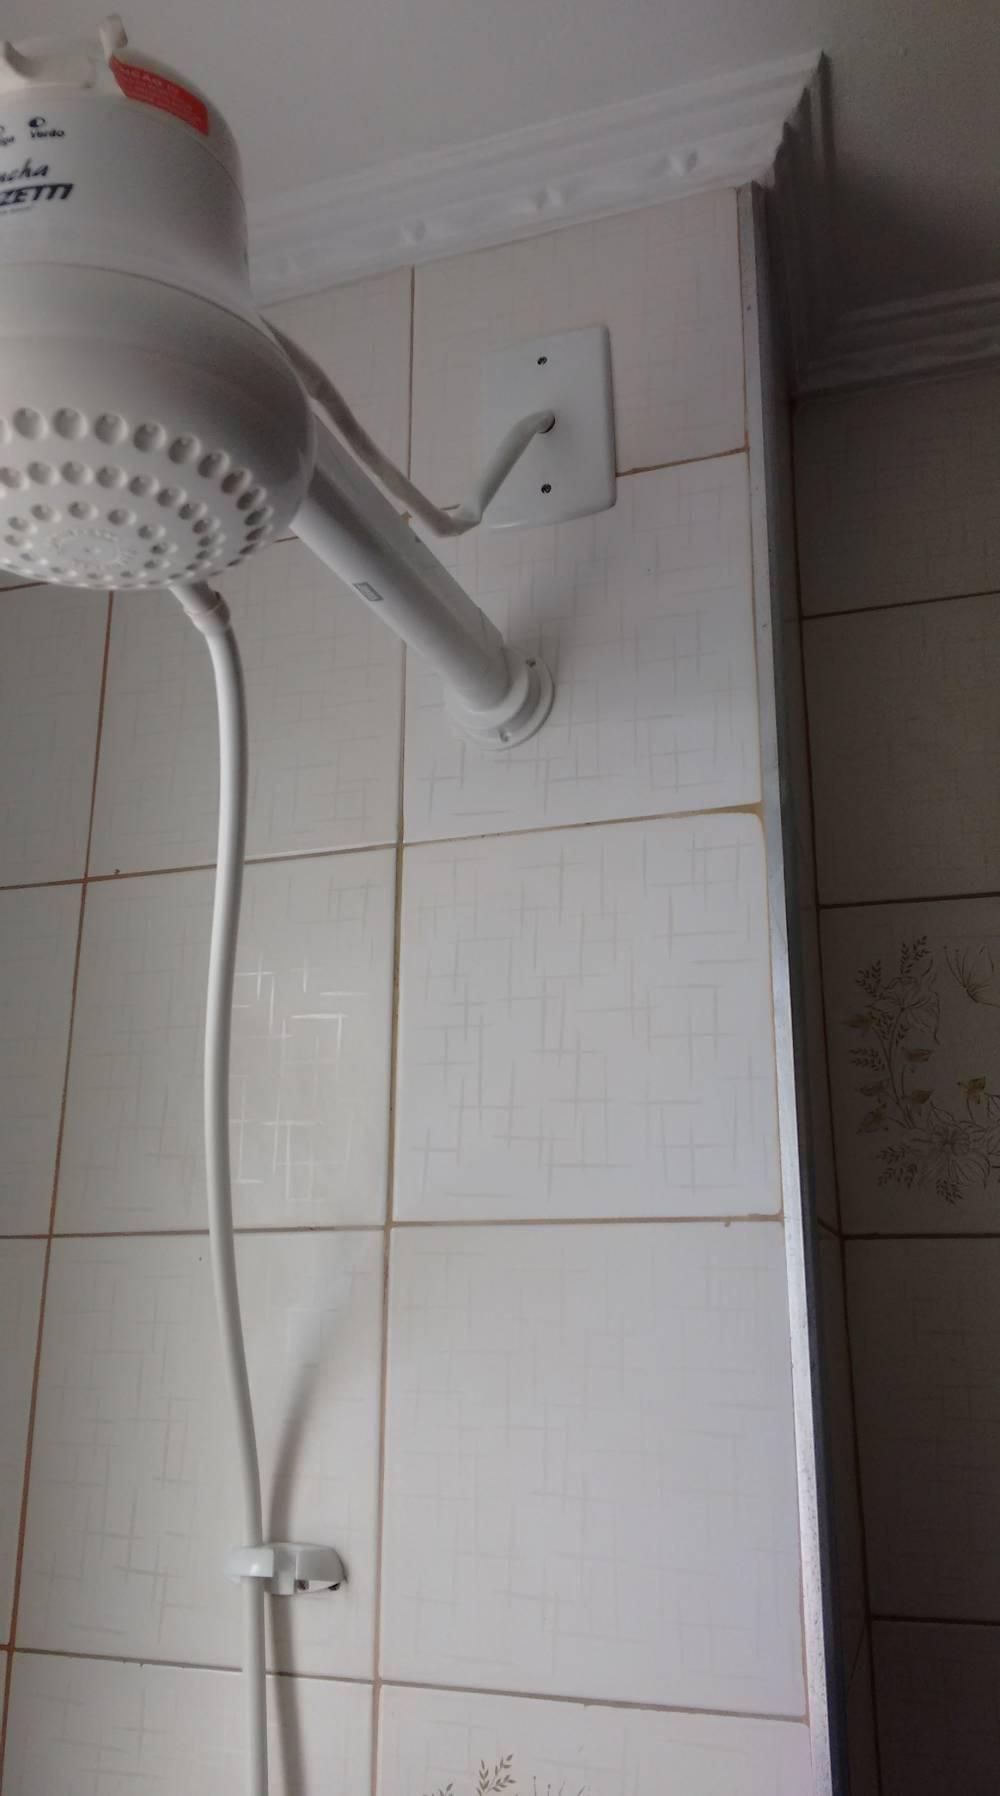 Valor de Serviços de Eletricista Residencial na Vila Fláquer - Eletricista na Zona Leste